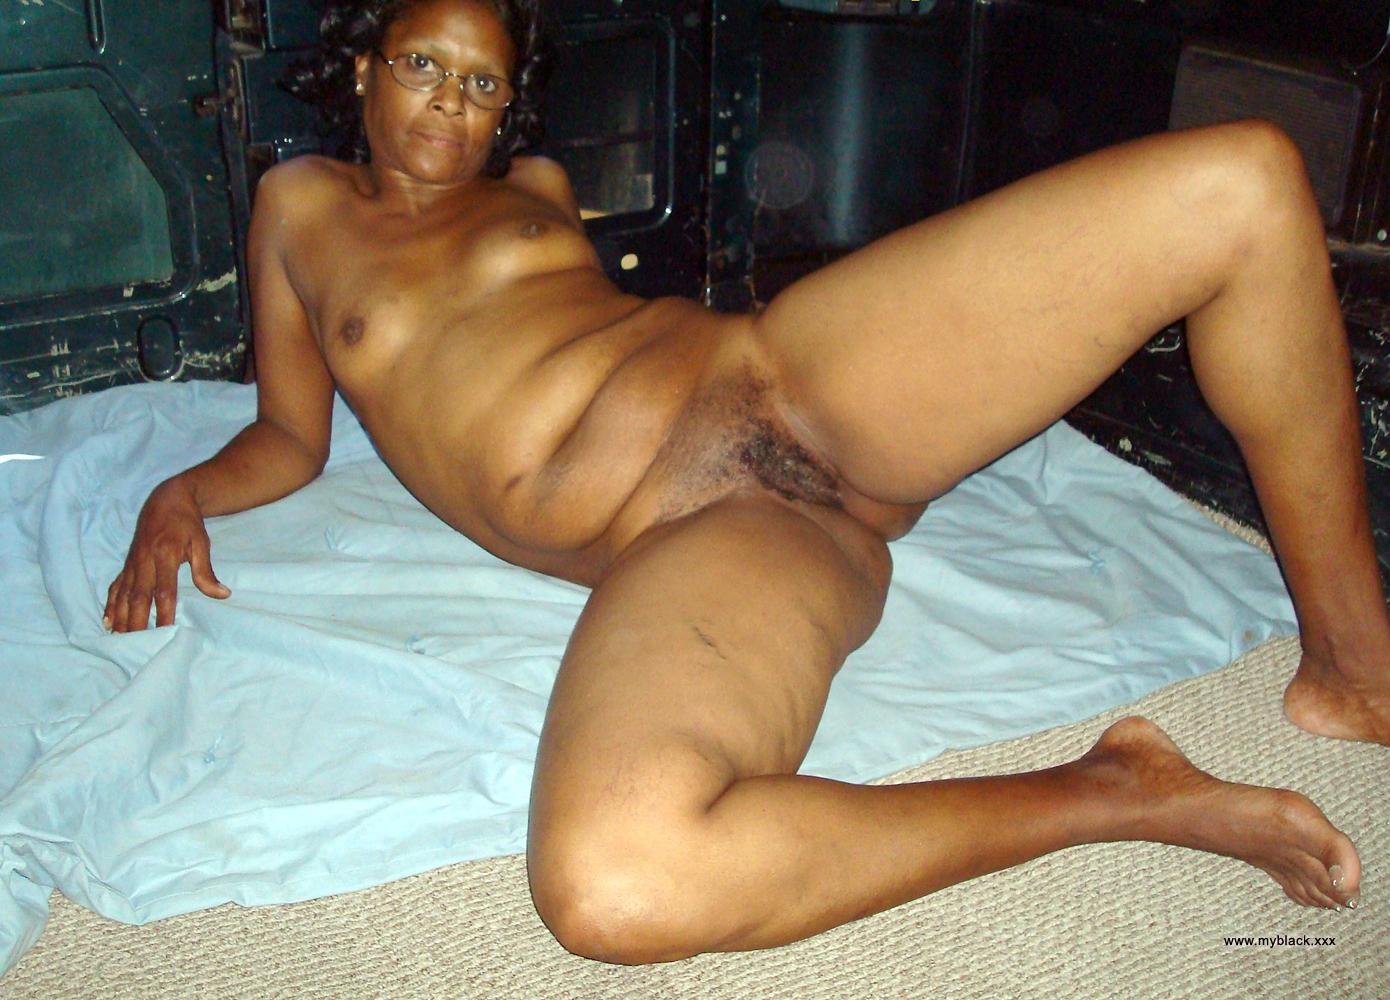 Mature black women posing nude Black Amateurs Naked Black Mature Woman Posing In White Pantie Public